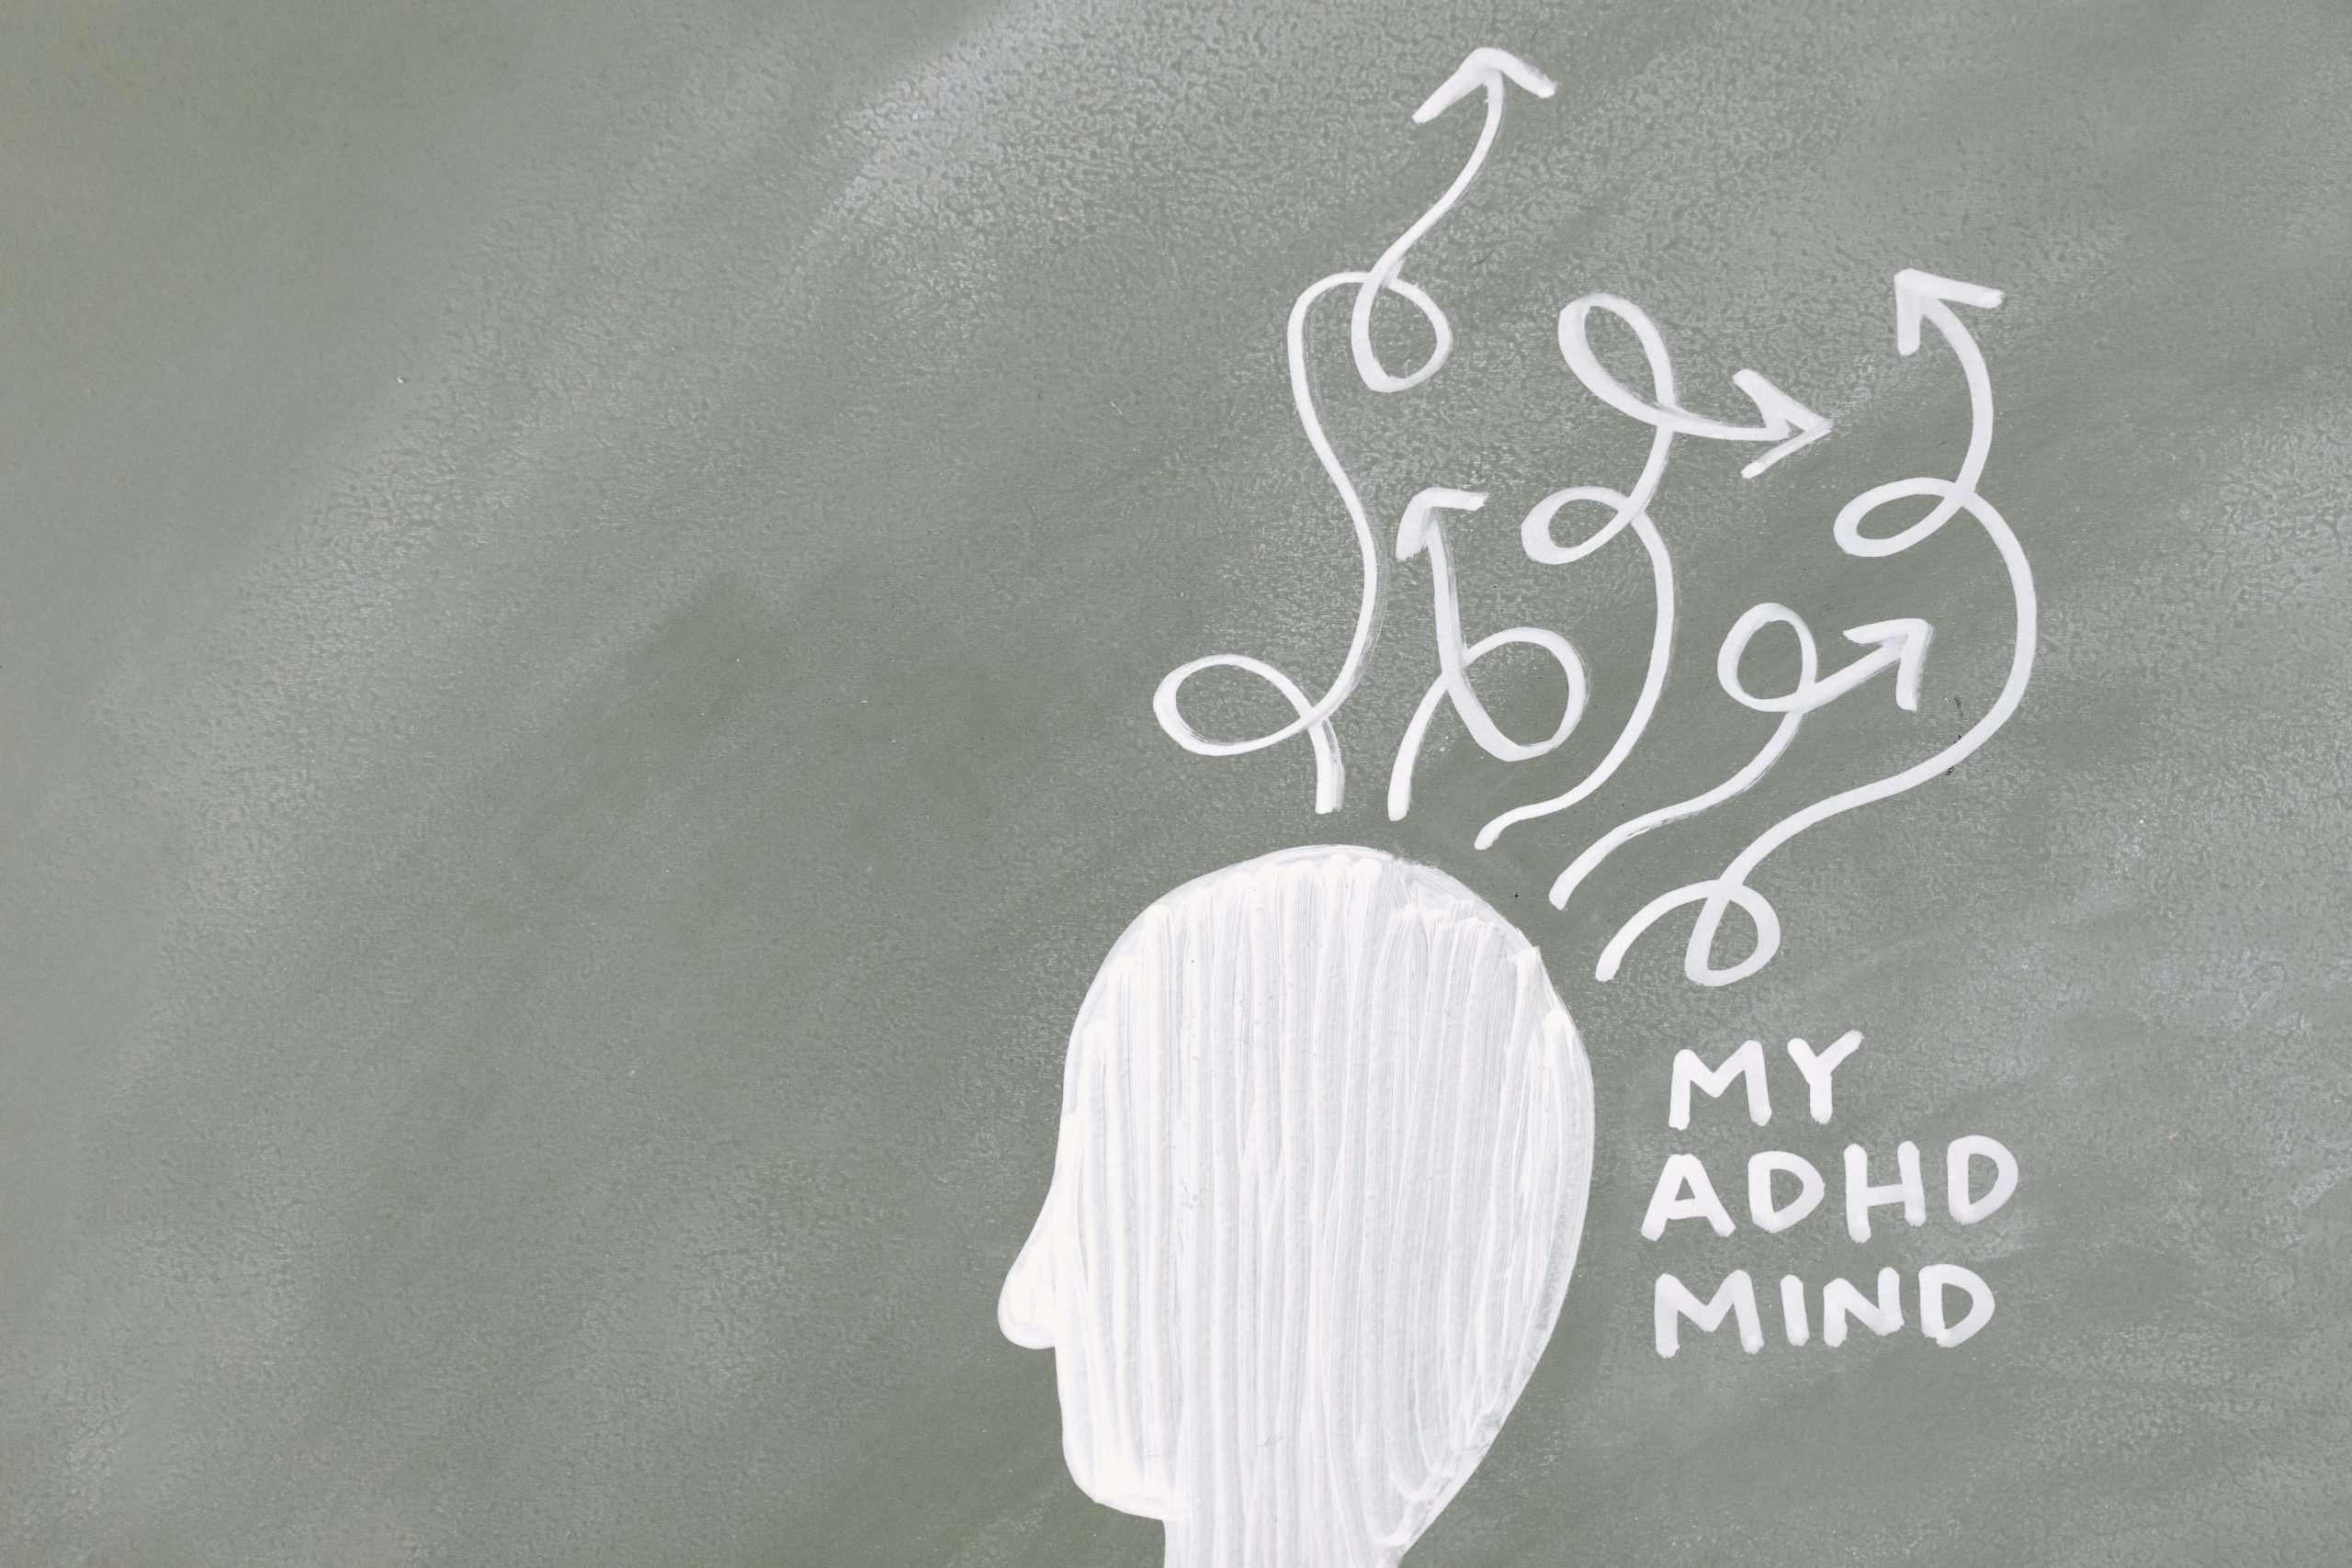 Chalkboard illustration for an adhd mind.